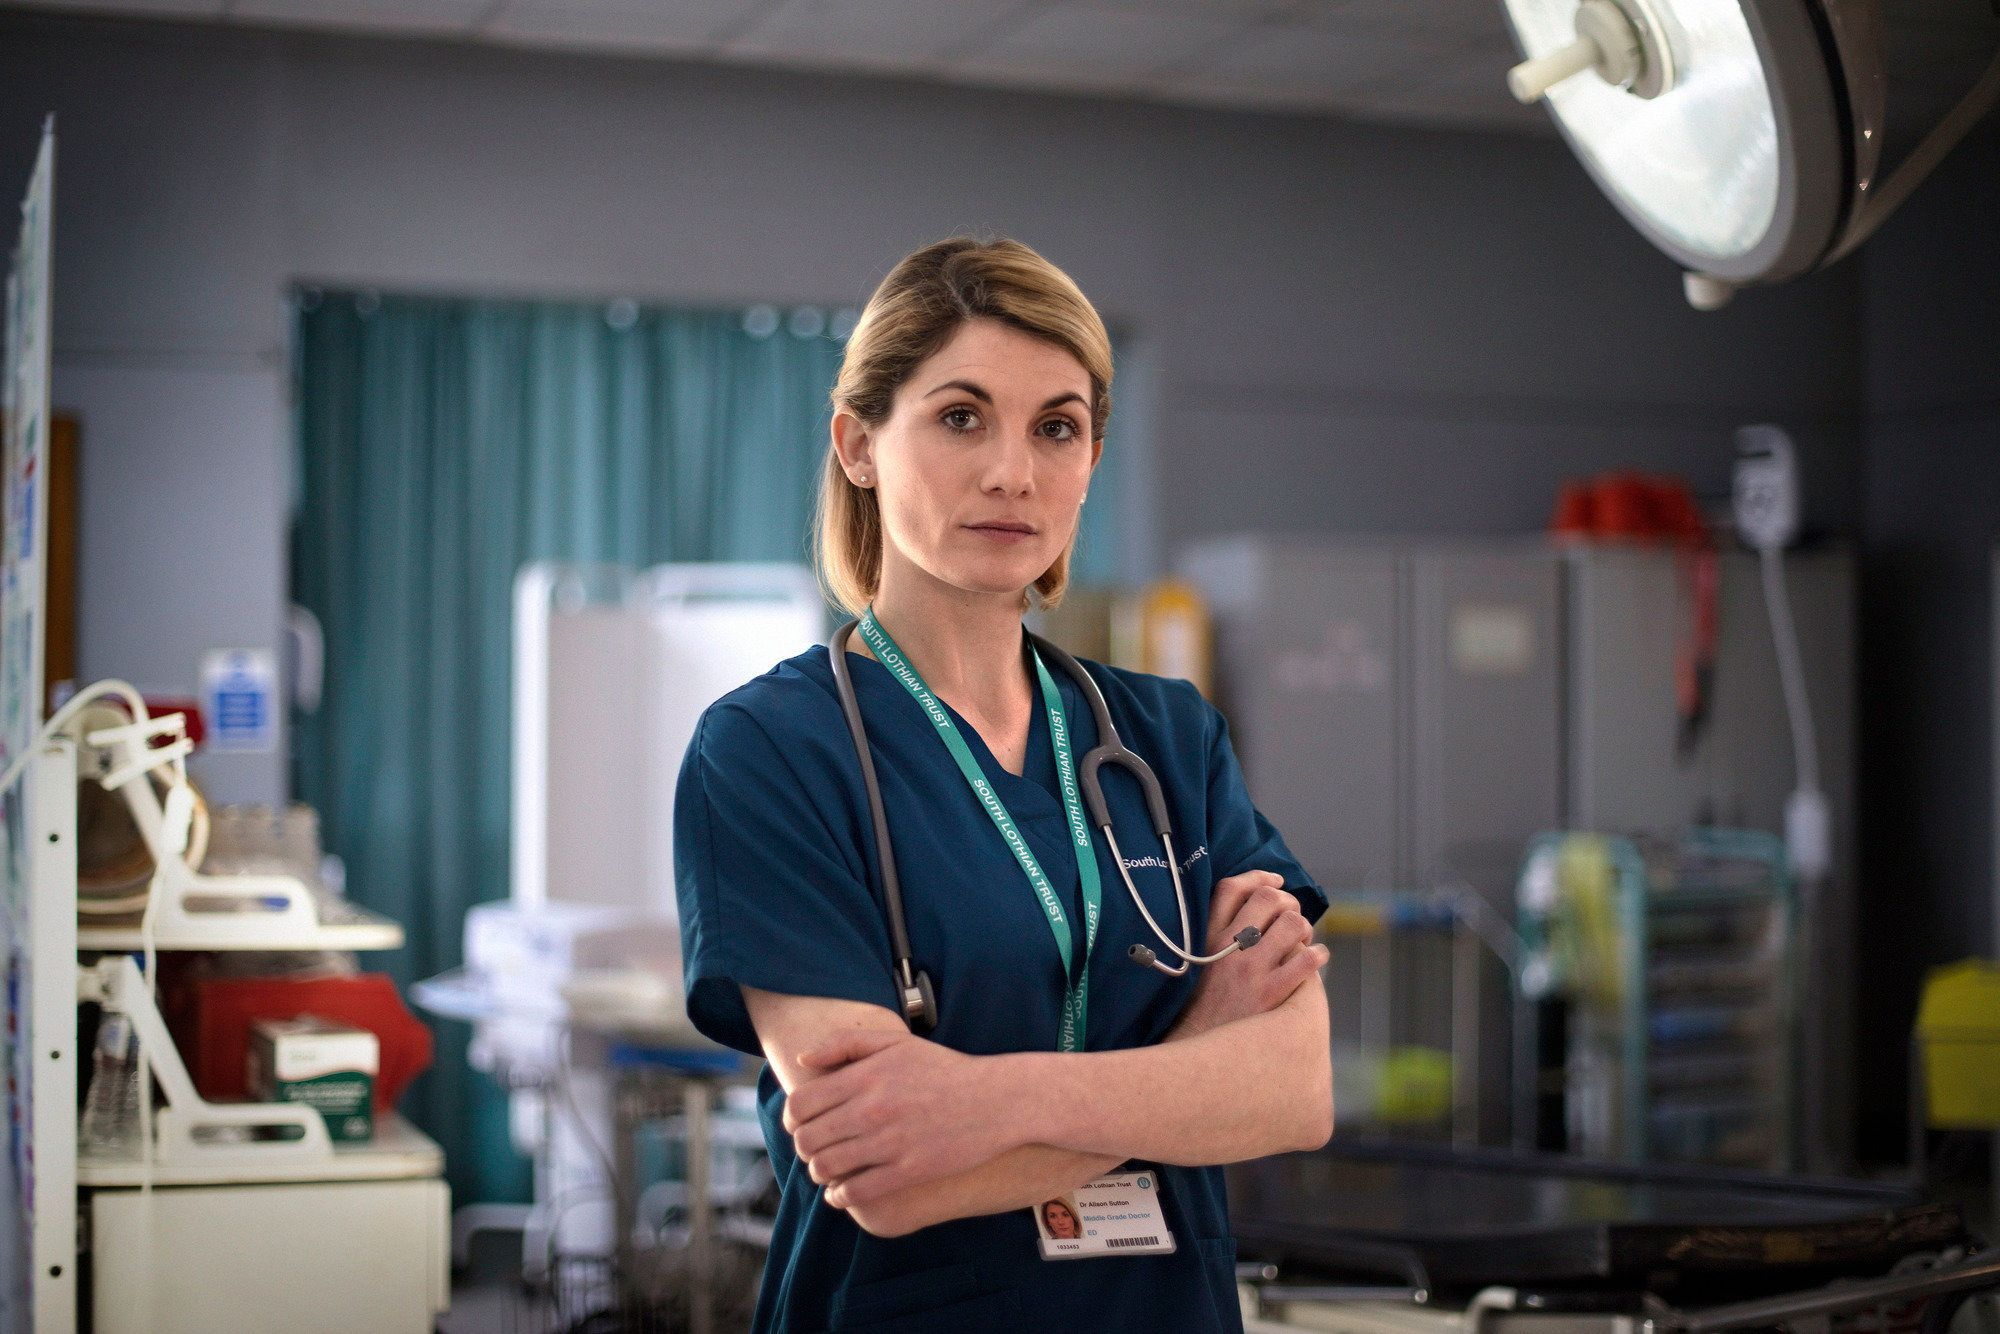 Here's The Lowdown On Jodie Whittaker's New BBC Drama 'Trust